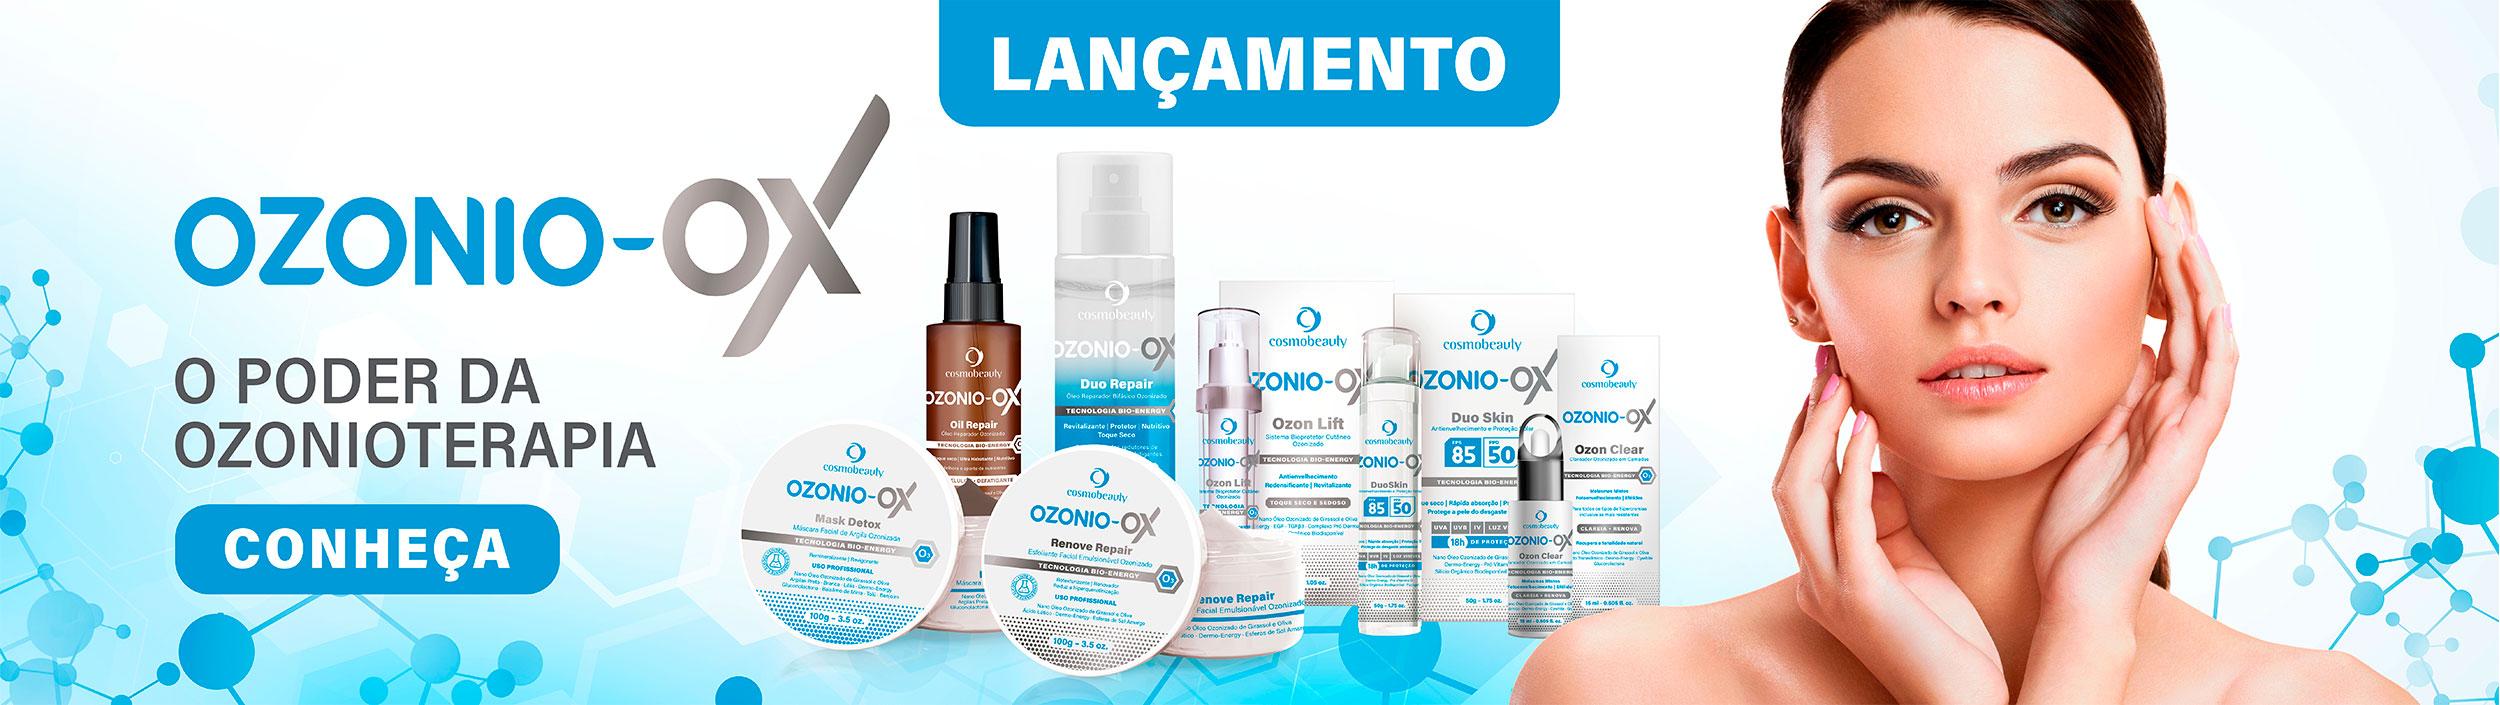 OzonioOX-banner-site